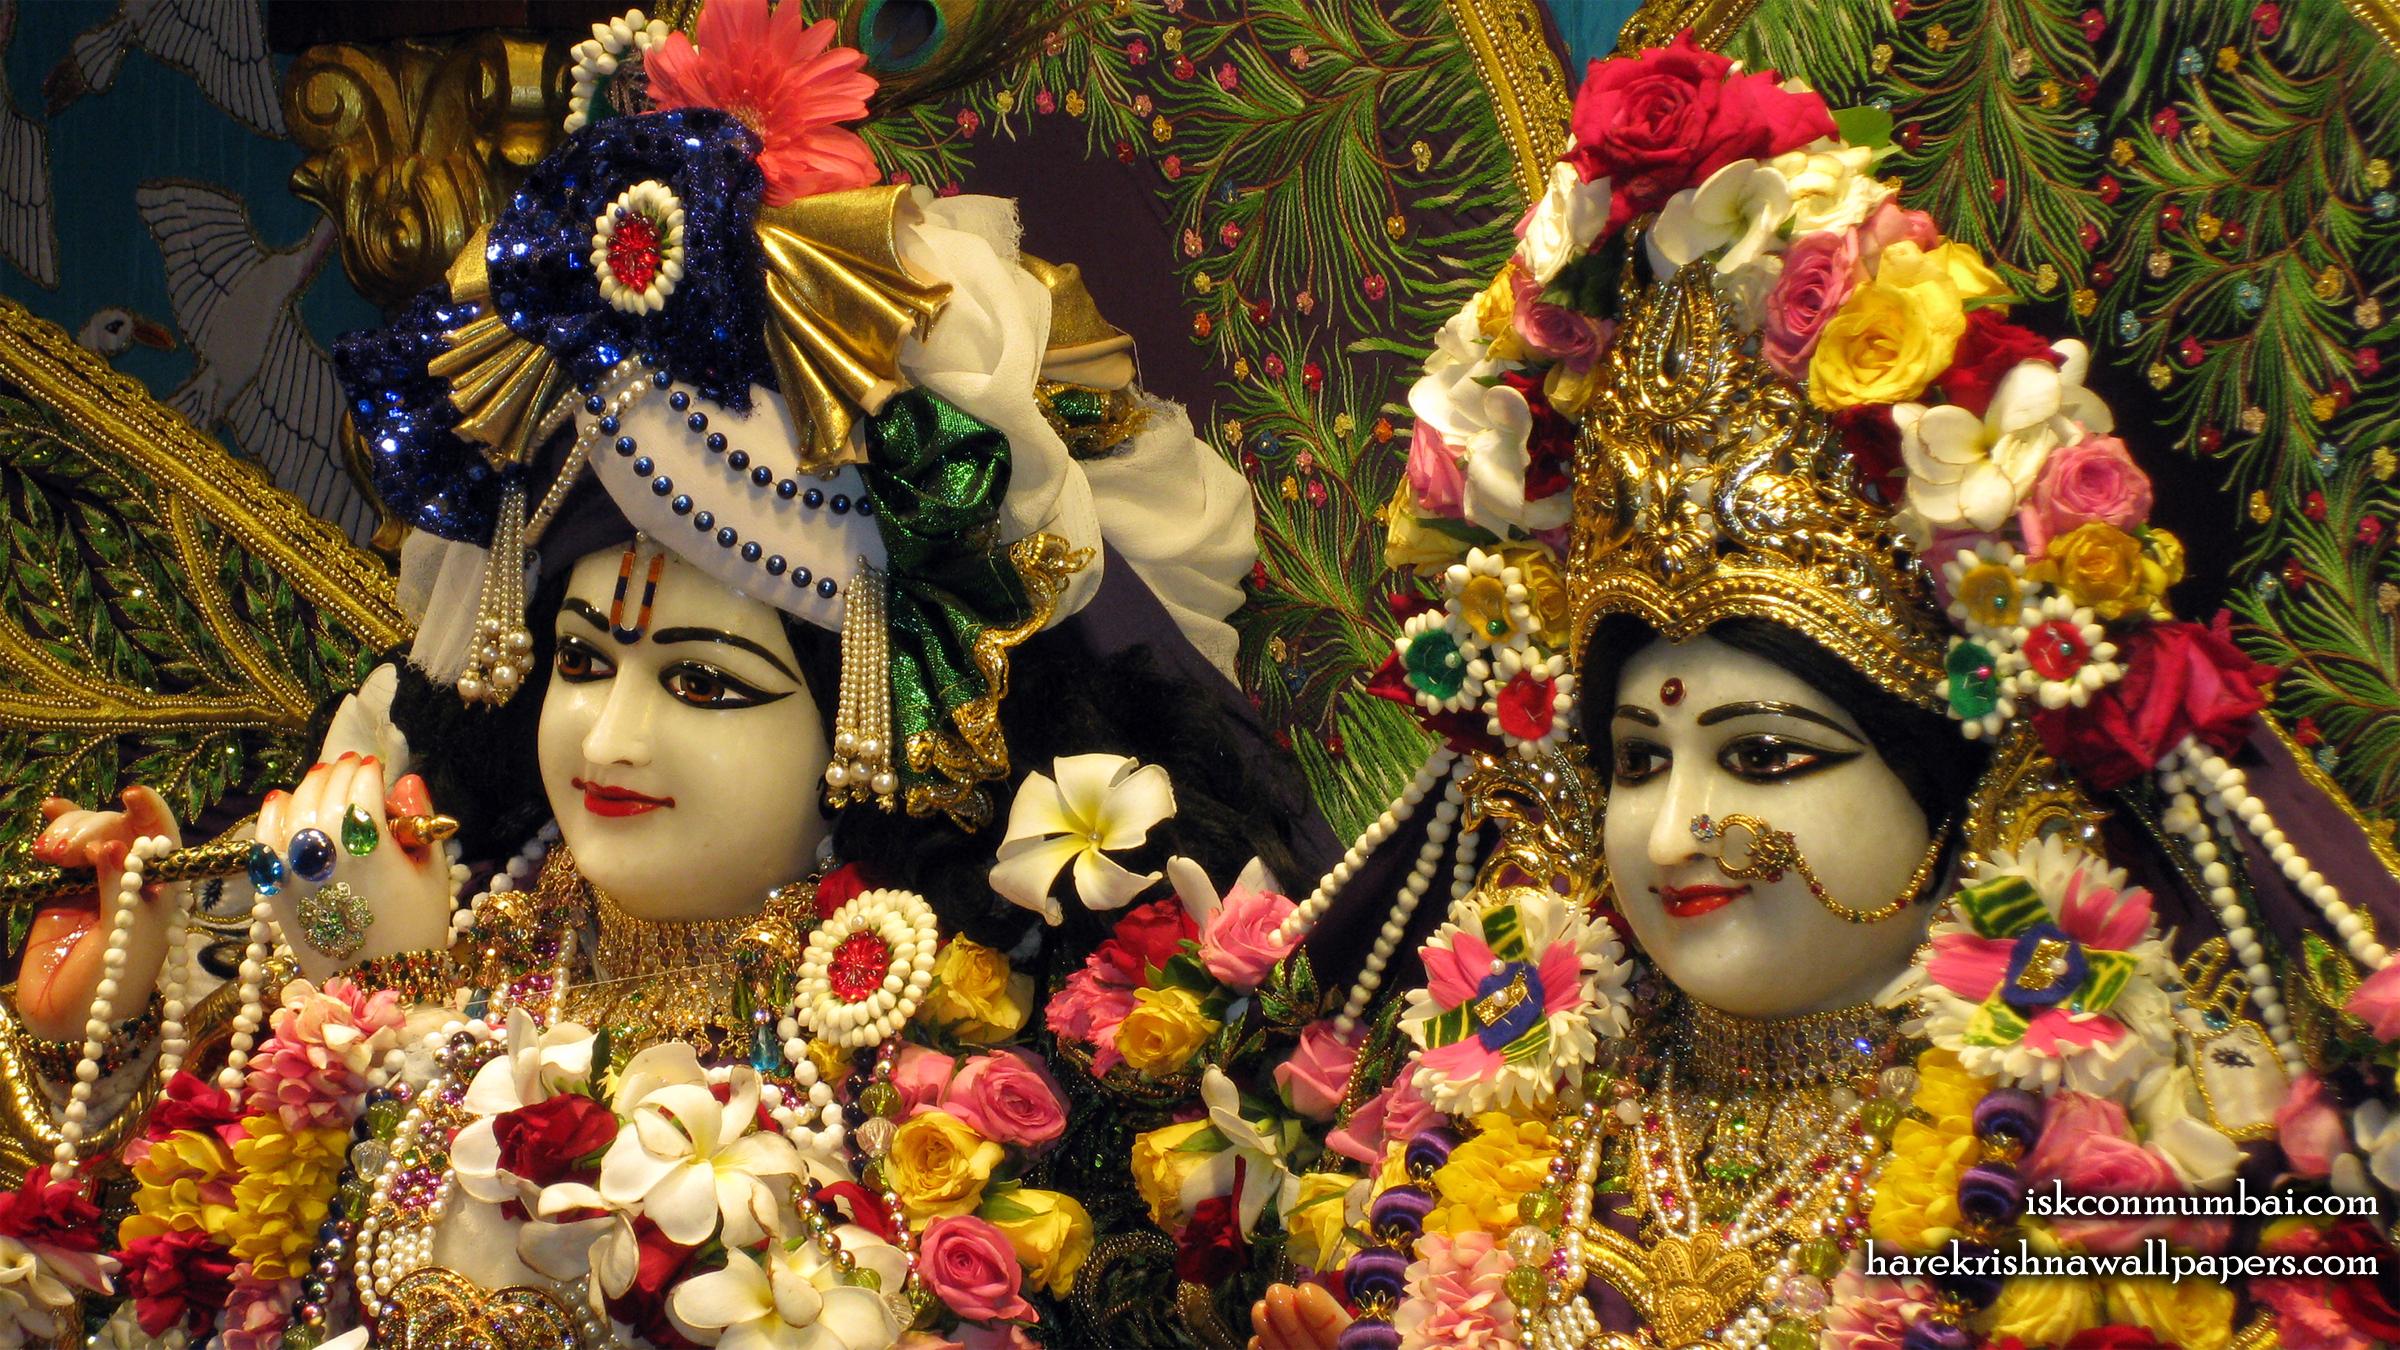 Sri Sri Radha Rasabihari Close up Wallpaper (012) Size 2400x1350 Download